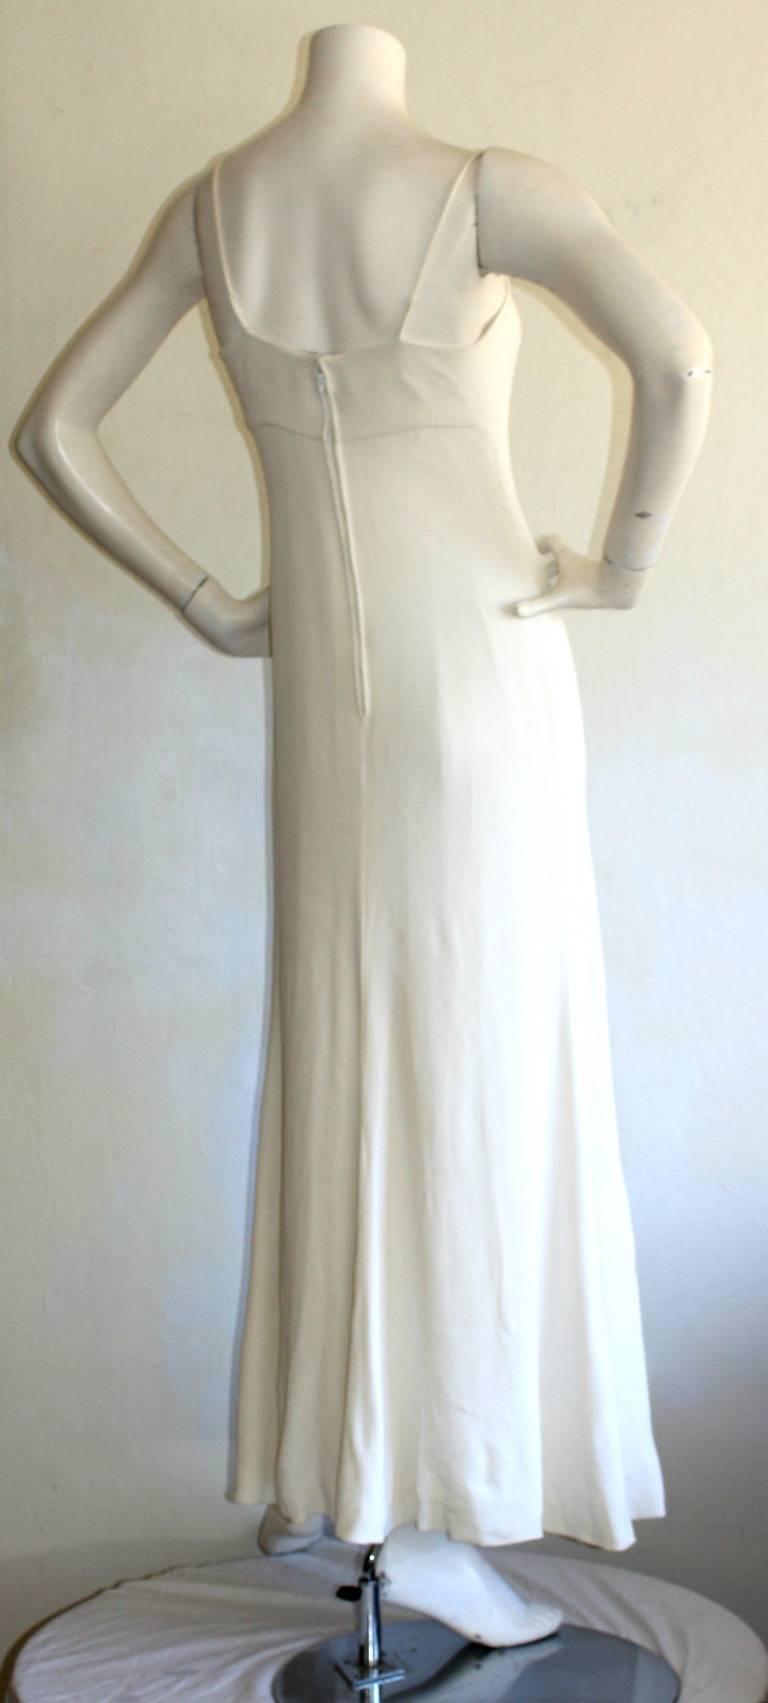 Beautiful 1970s Vintage Oscar de la Renta White Jewel Gown Perfect Wedding Dress 8